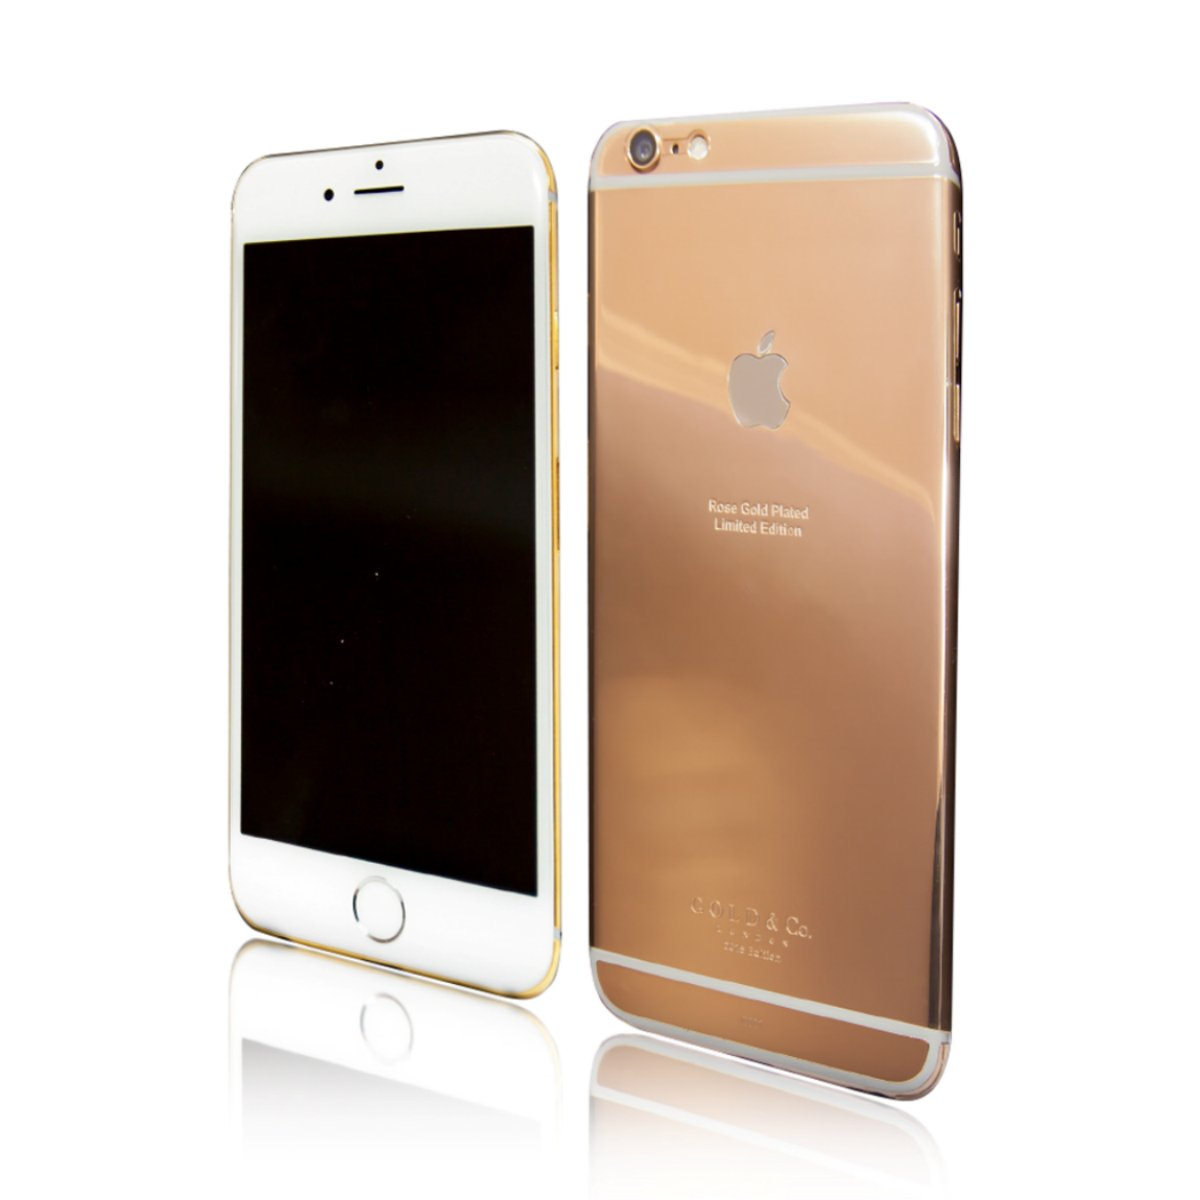 gold co iphone 6 plus rose gold. Black Bedroom Furniture Sets. Home Design Ideas